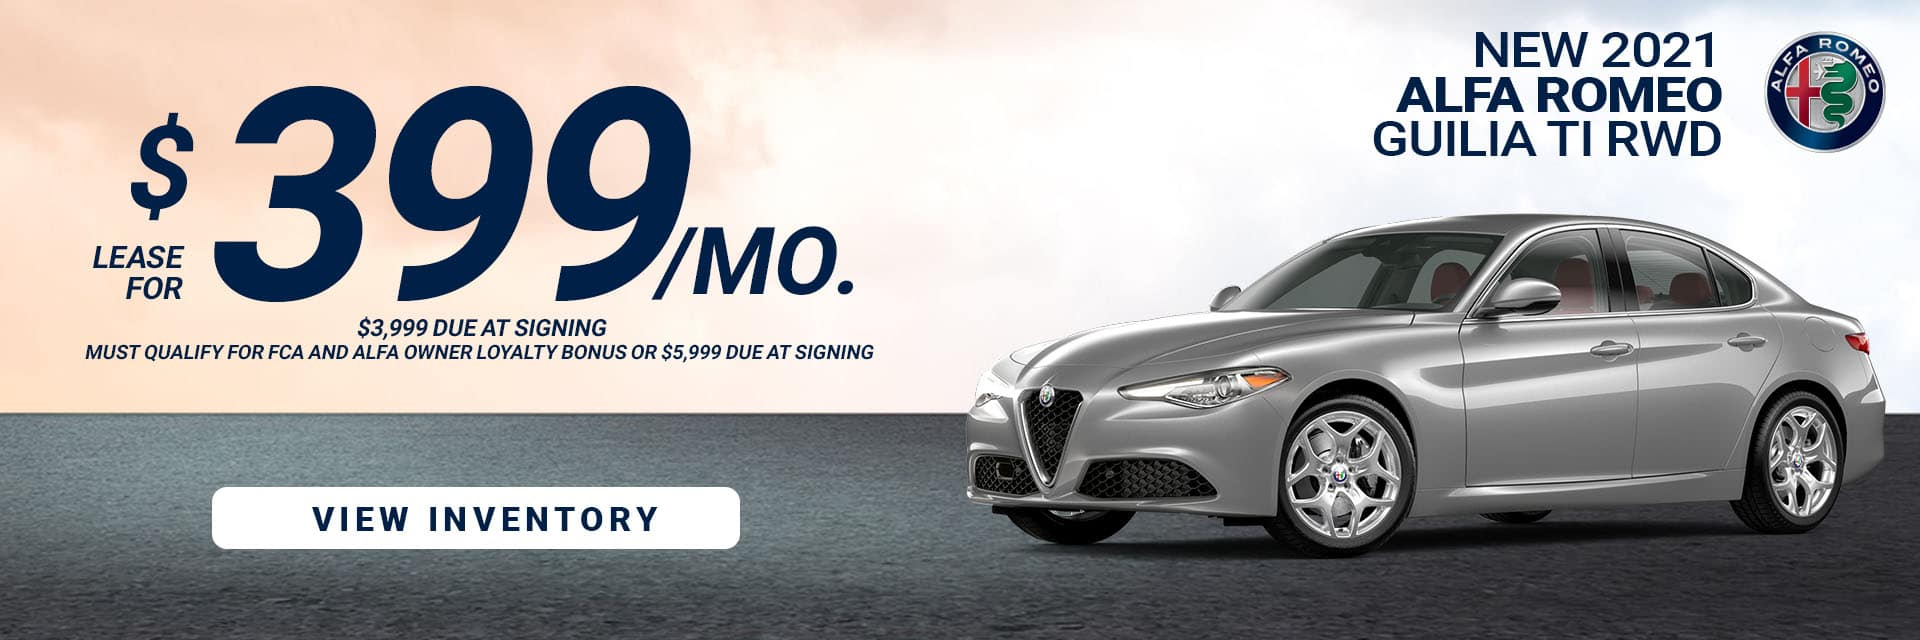 SLAR-June 20212021 Alfa Romeo Giulia copy